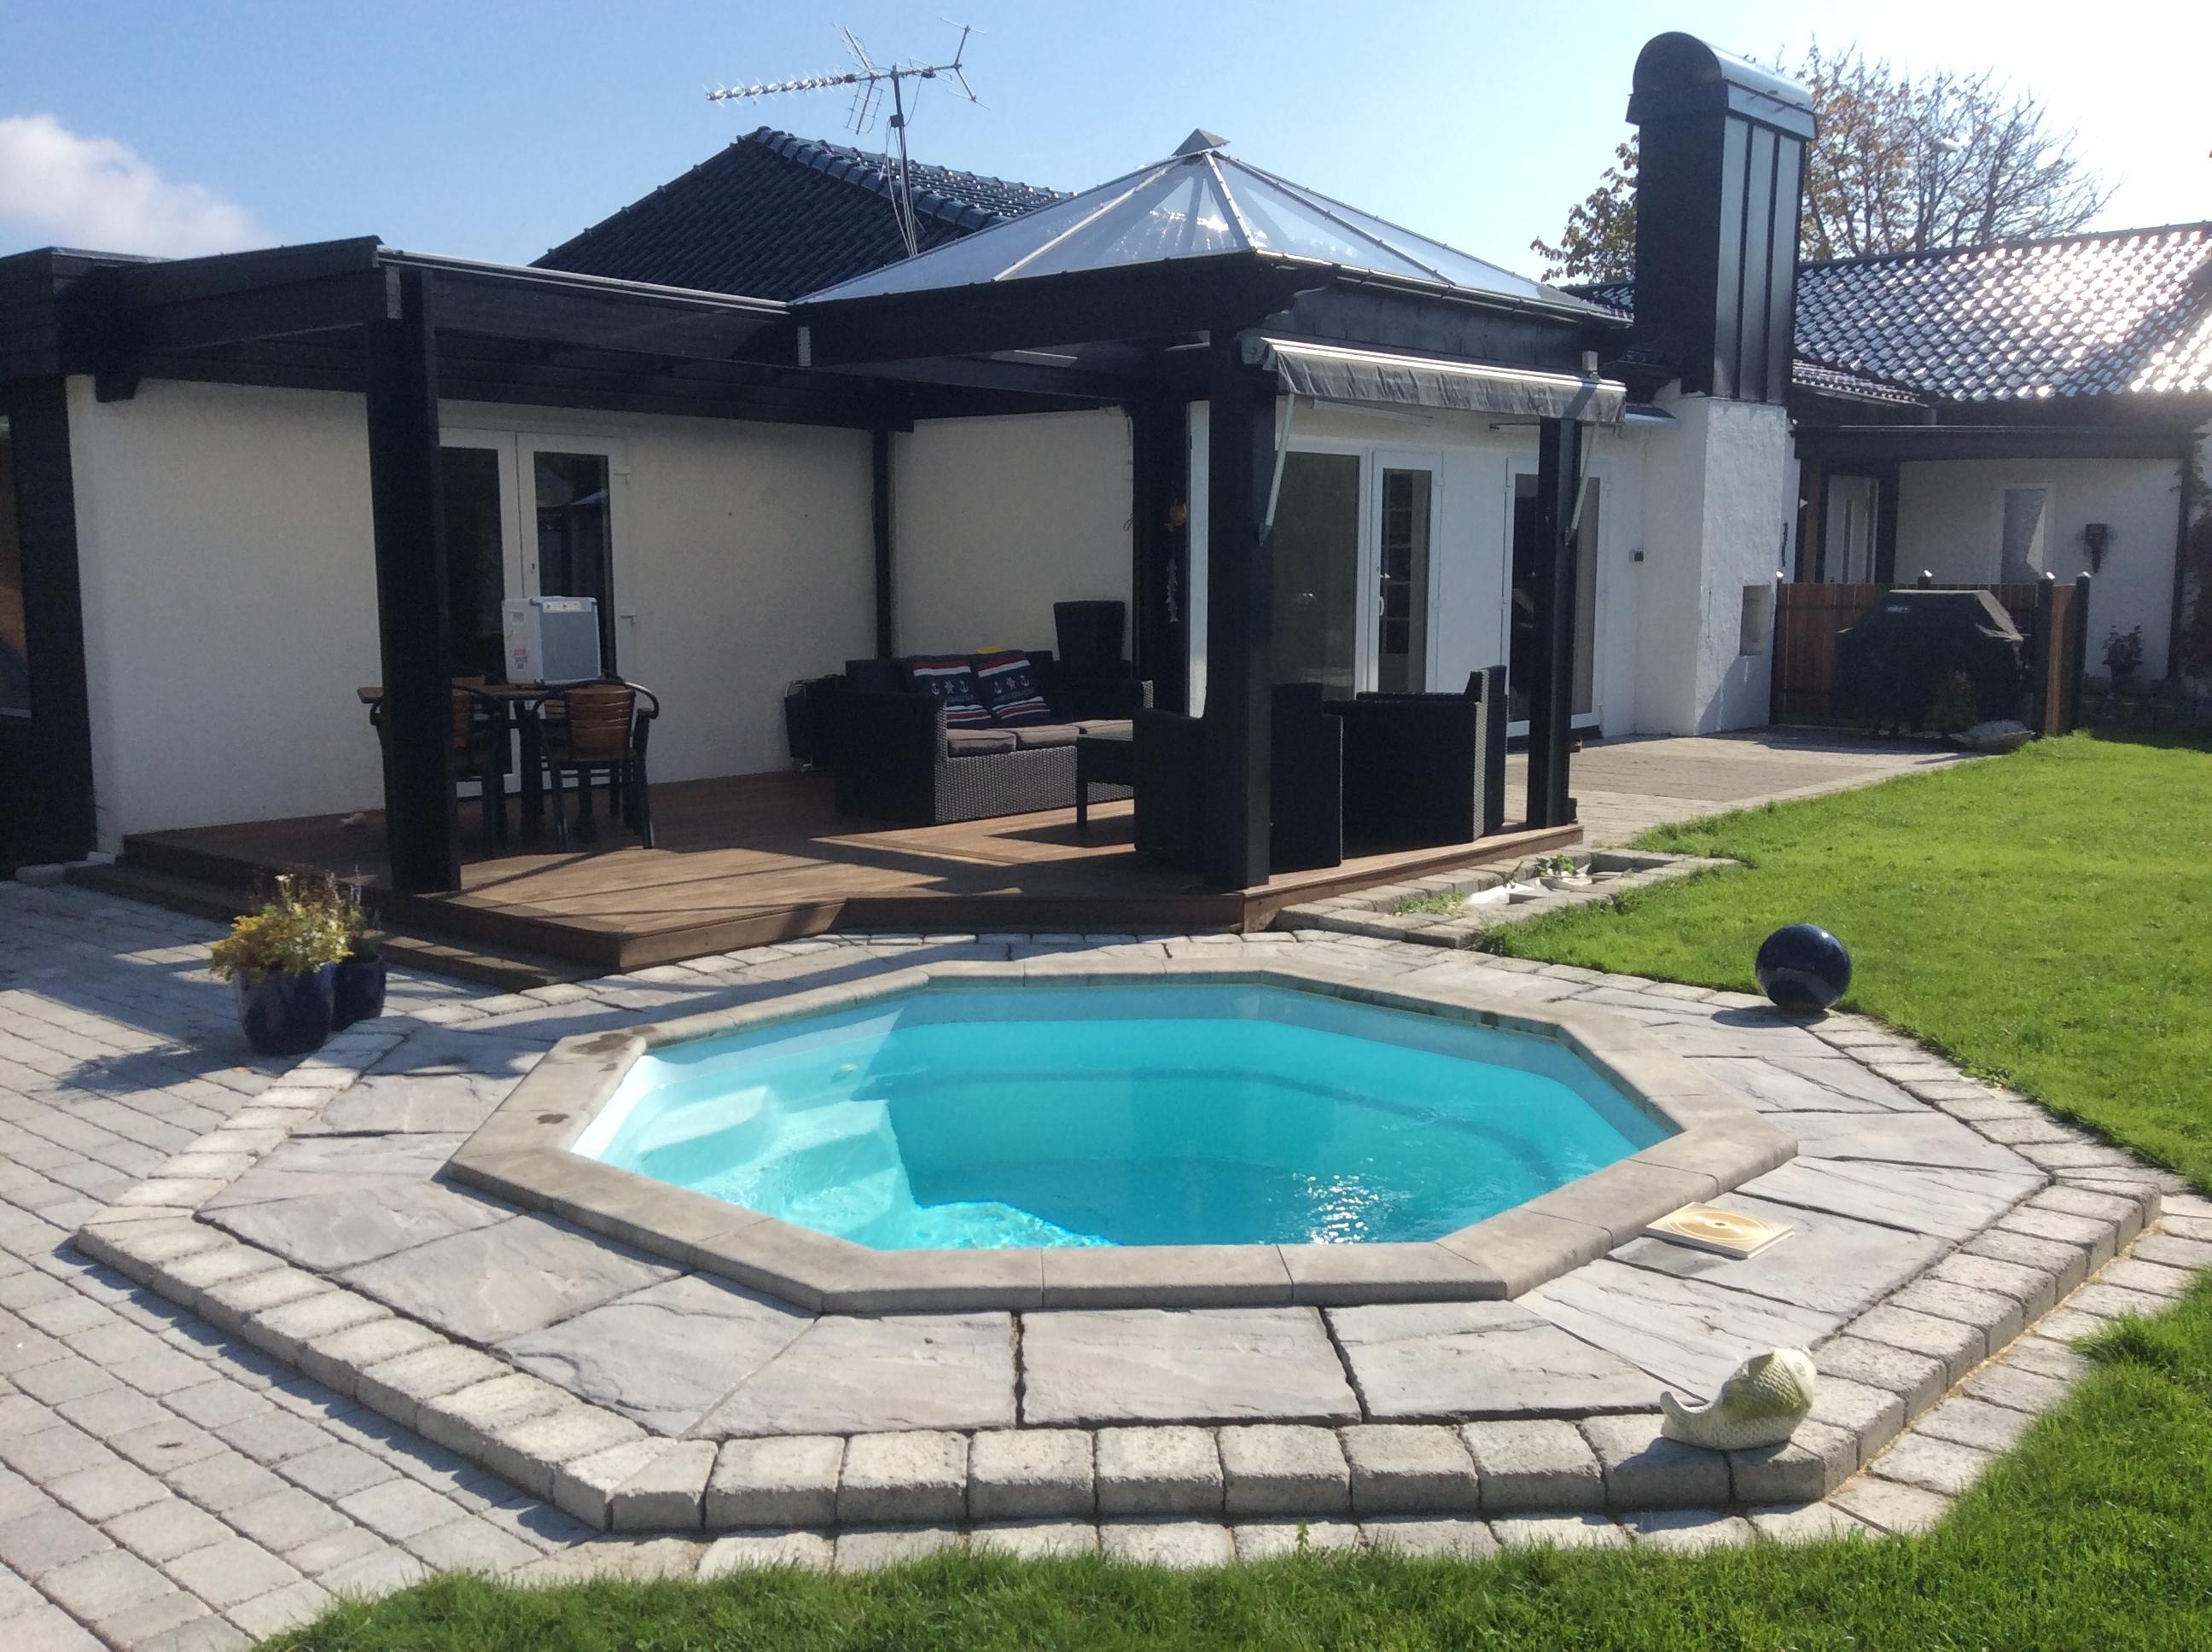 Oktagon Familypool - Liten pool - åttakantig pool - rund pool - omkringliggande stenplattor